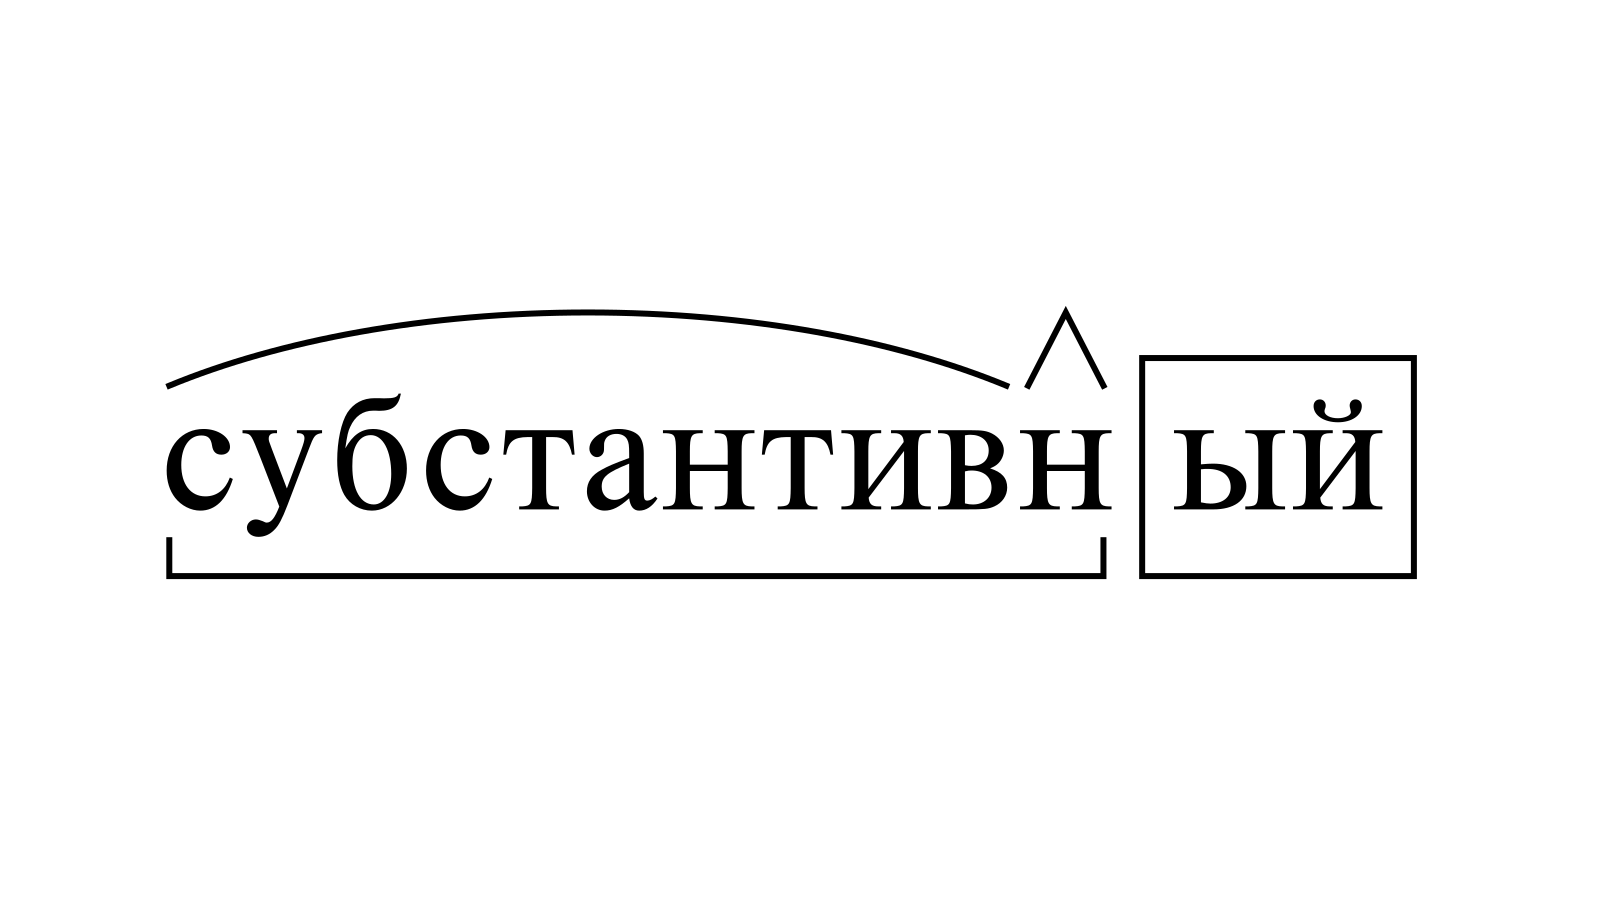 Разбор слова «субстантивный» по составу